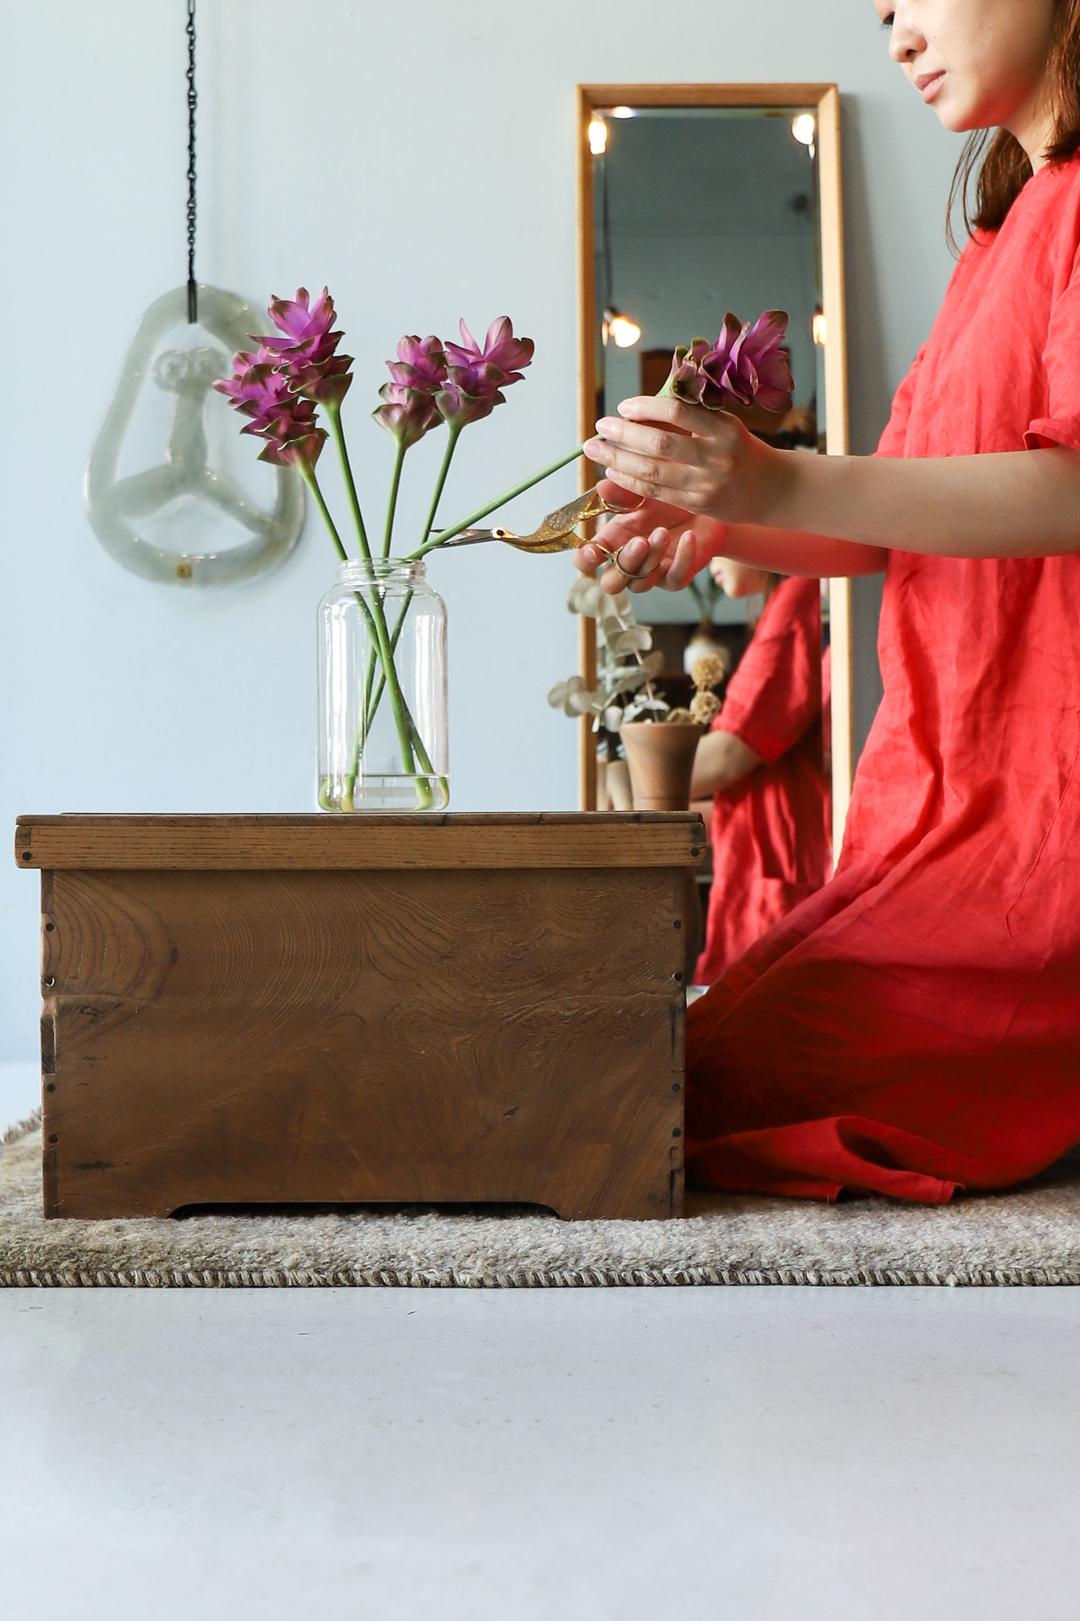 Japanese Antique Box Table/箱膳 お膳 テーブル ちゃぶ台 収納 アンティーク 古道具 和家具